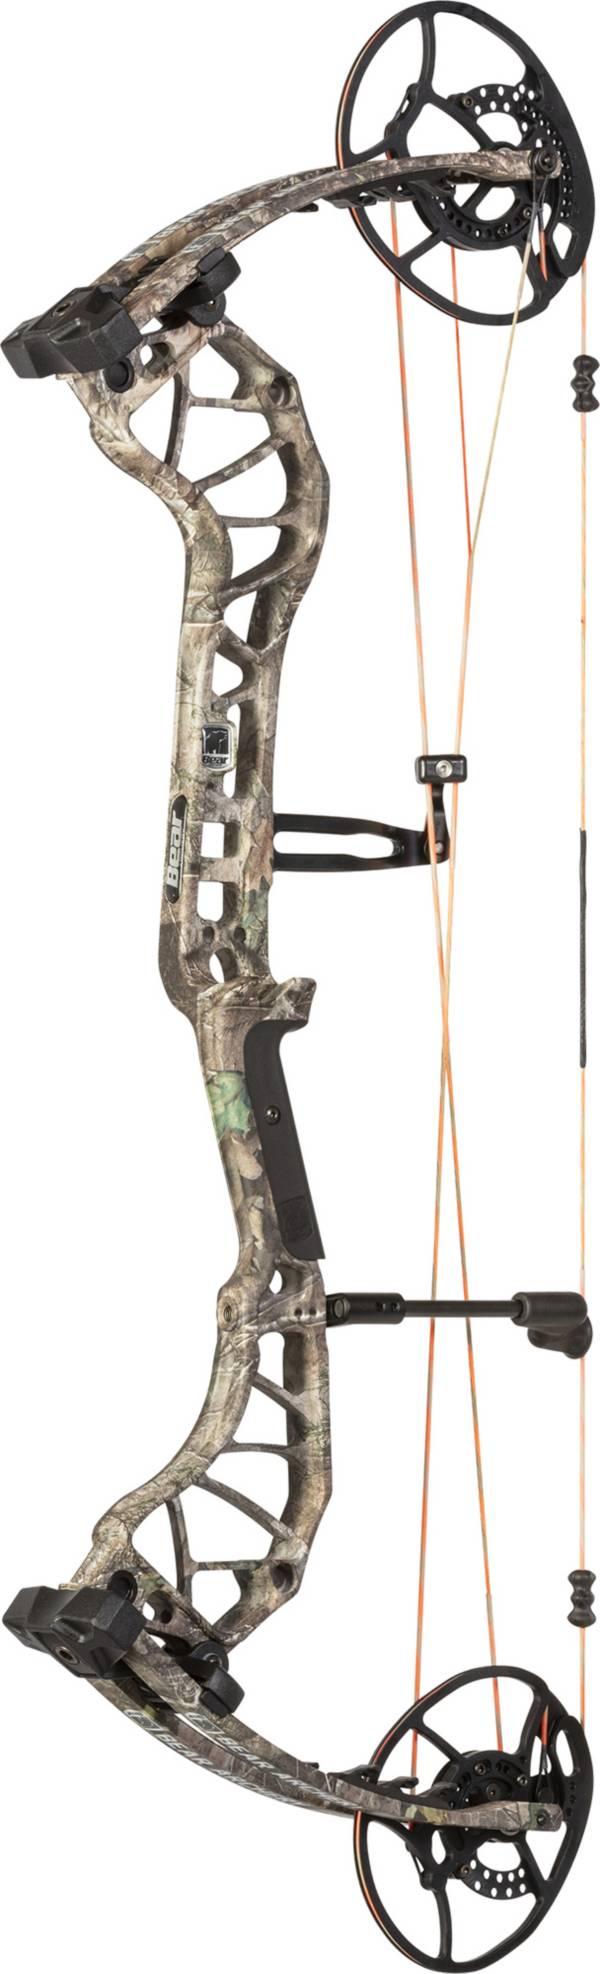 Bear Archery Divergent Compound Bow product image